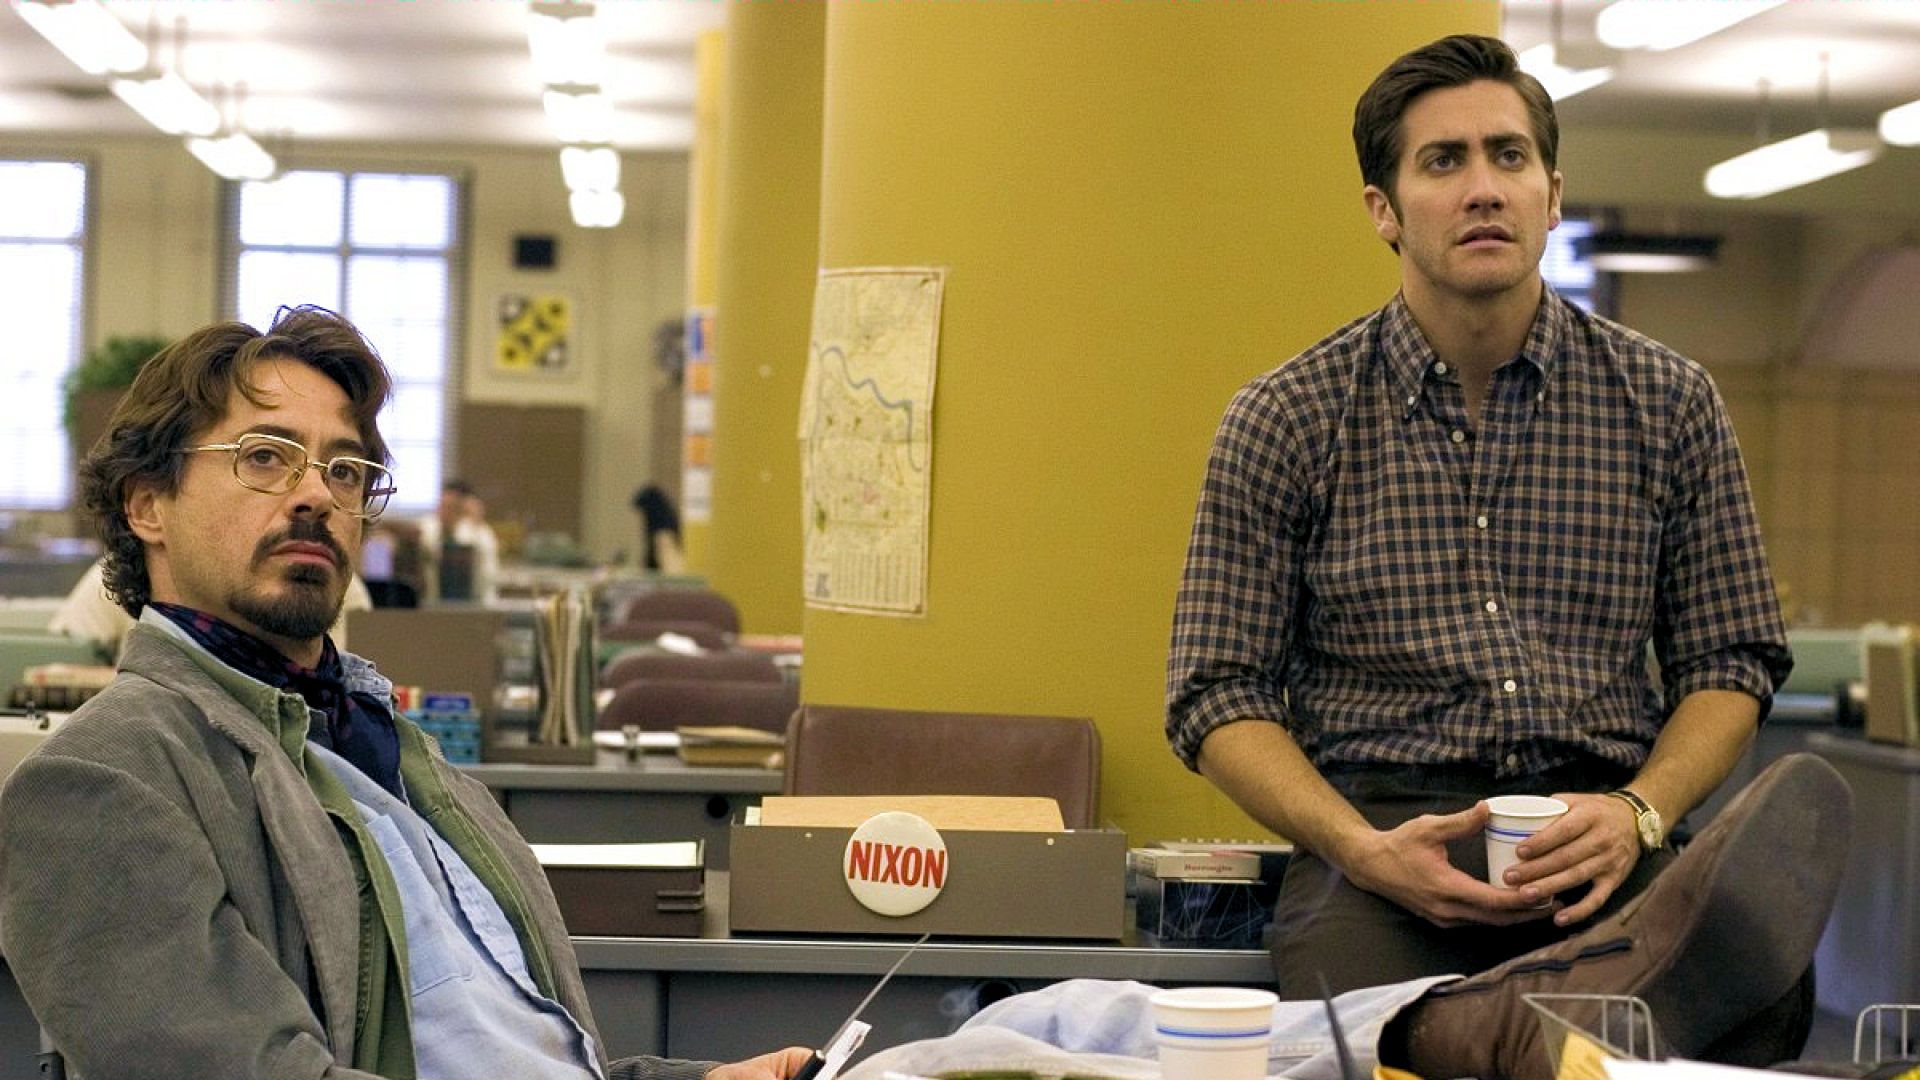 Seguís alguna serie? - Página 21 Zodiac-downey-gyllenhaal